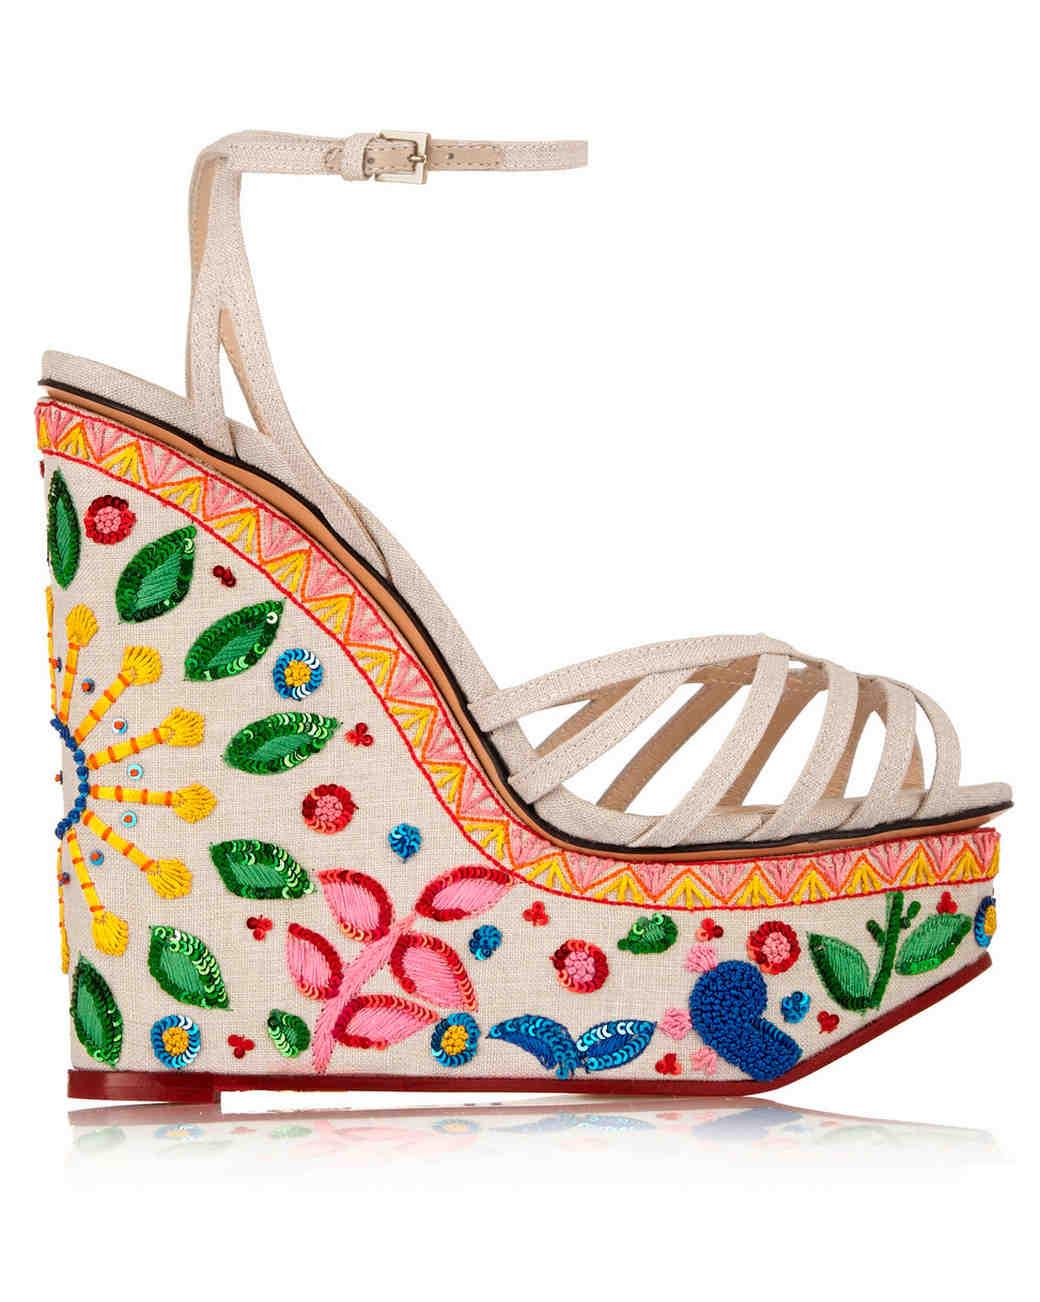 summer-wedding-shoes-charlotte-olympia-celebration-sandals-0515.jpg